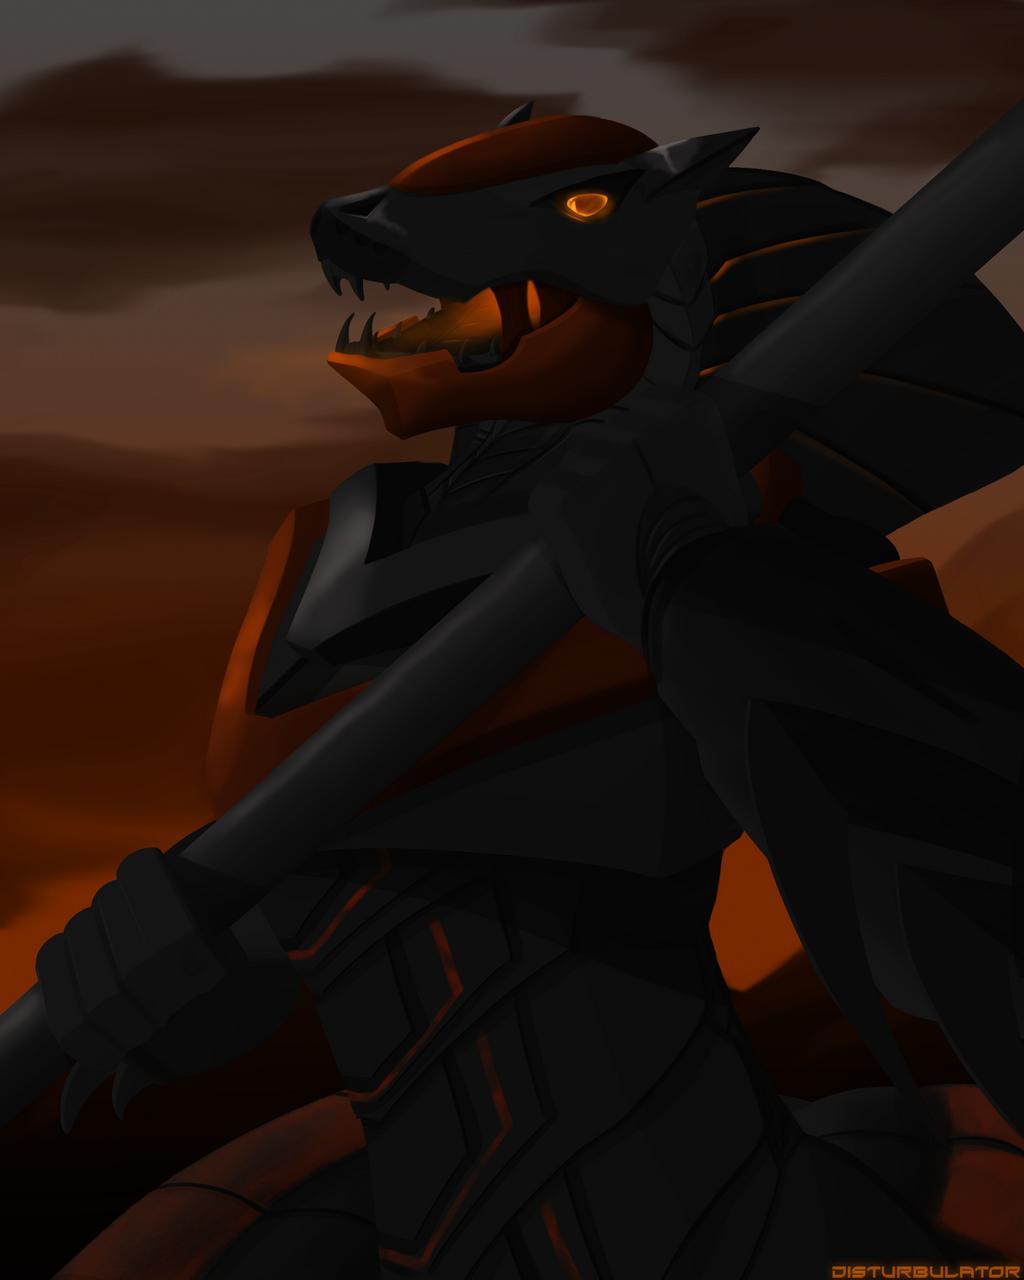 At Sunset by Disturbulator